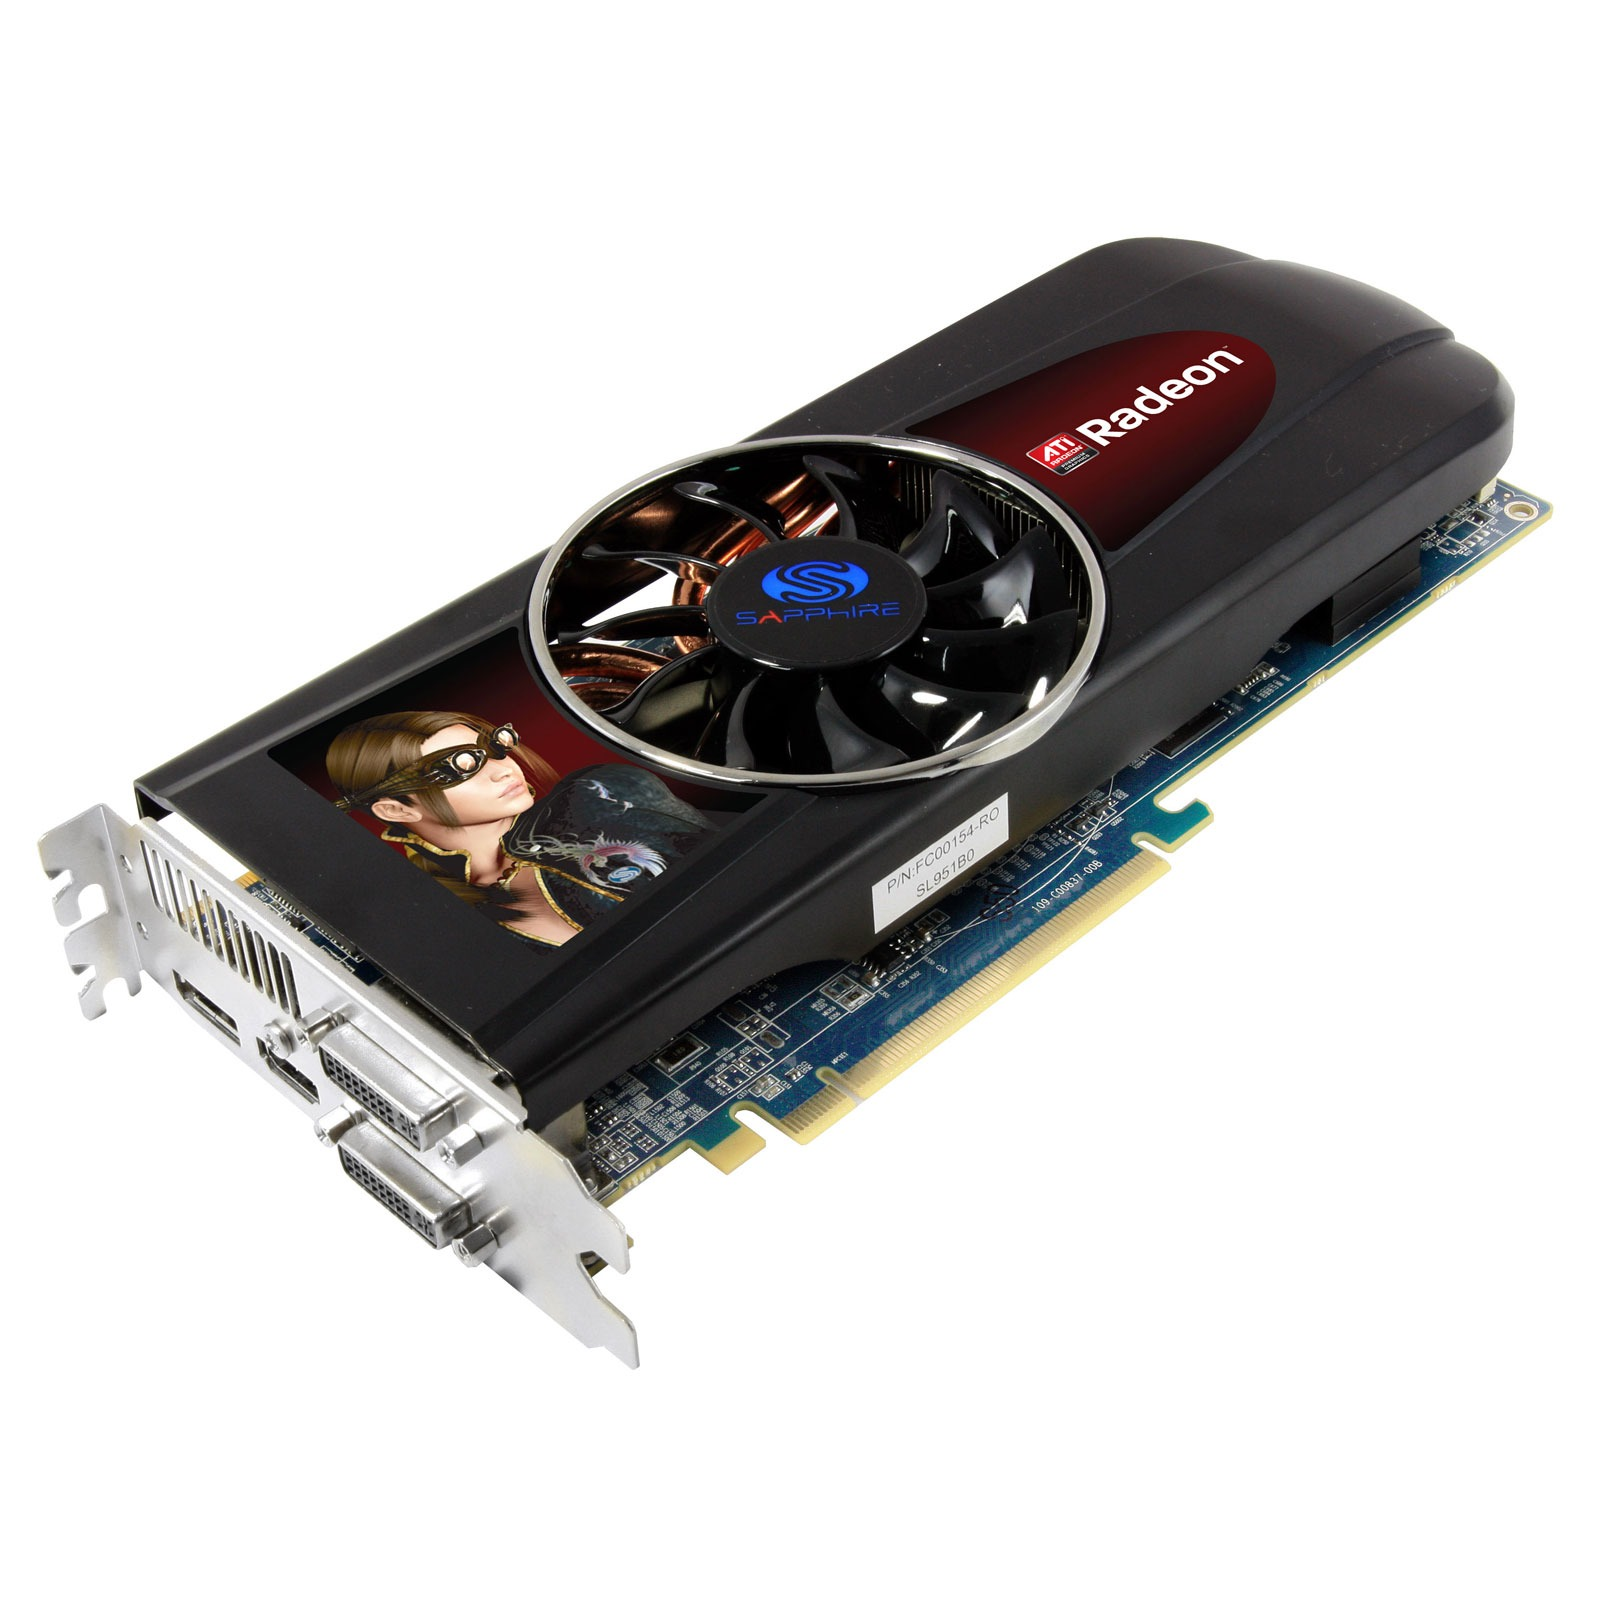 Carte graphique Sapphire Radeon HD 5850 1 GB 1 Go HDMI/Dual DVI/DisplayPort - PCI Express (ATI Radeon HD 5850)